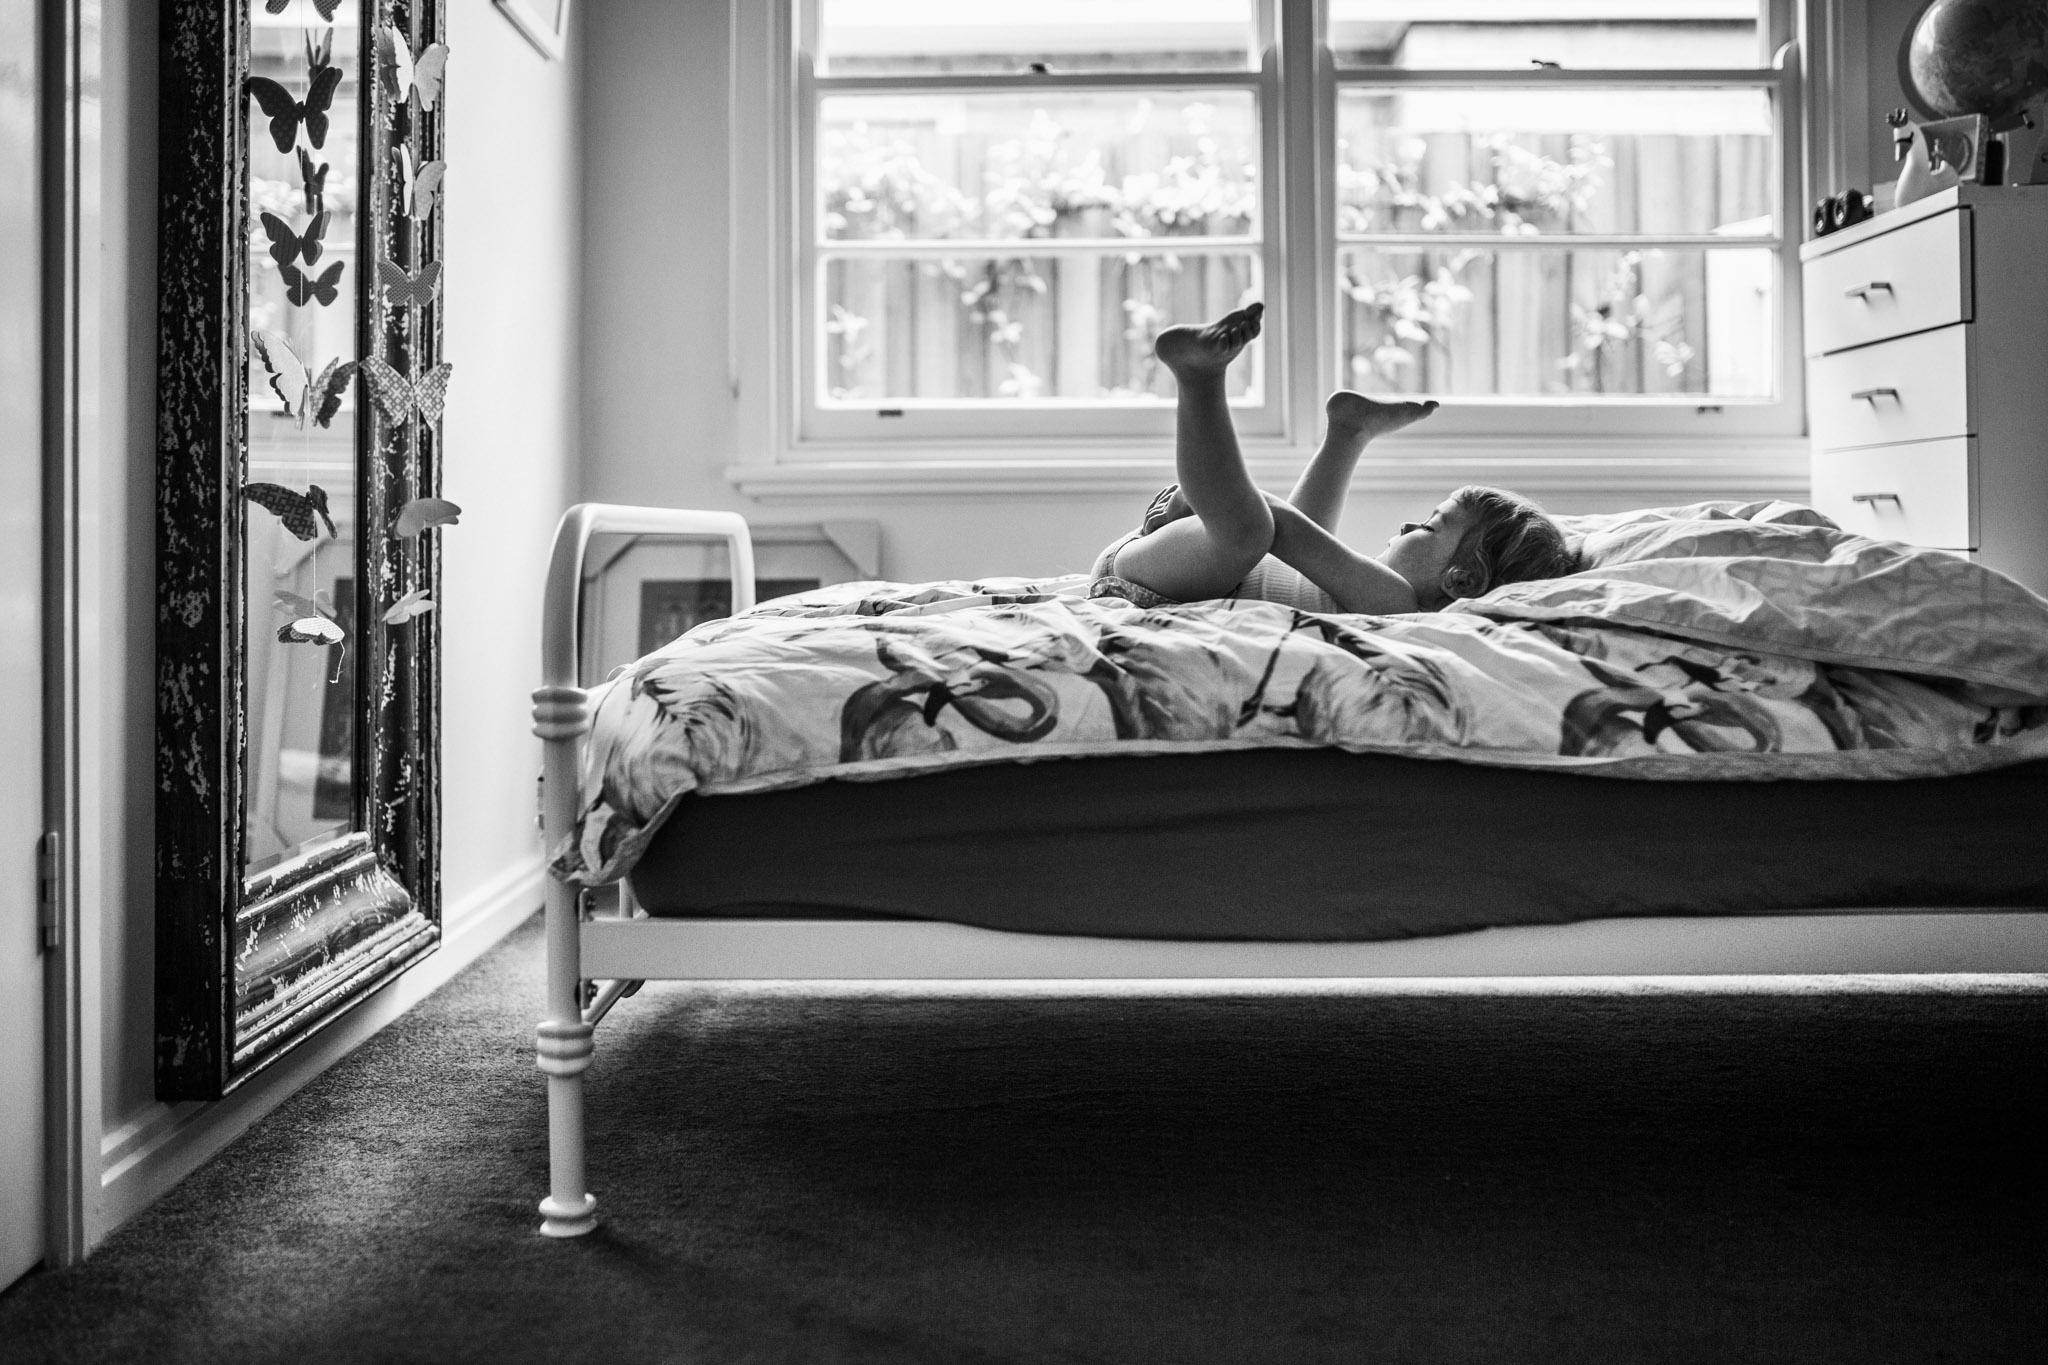 little-girl-playing-on-bed-with-flamingo-doona (1 of 1).jpg